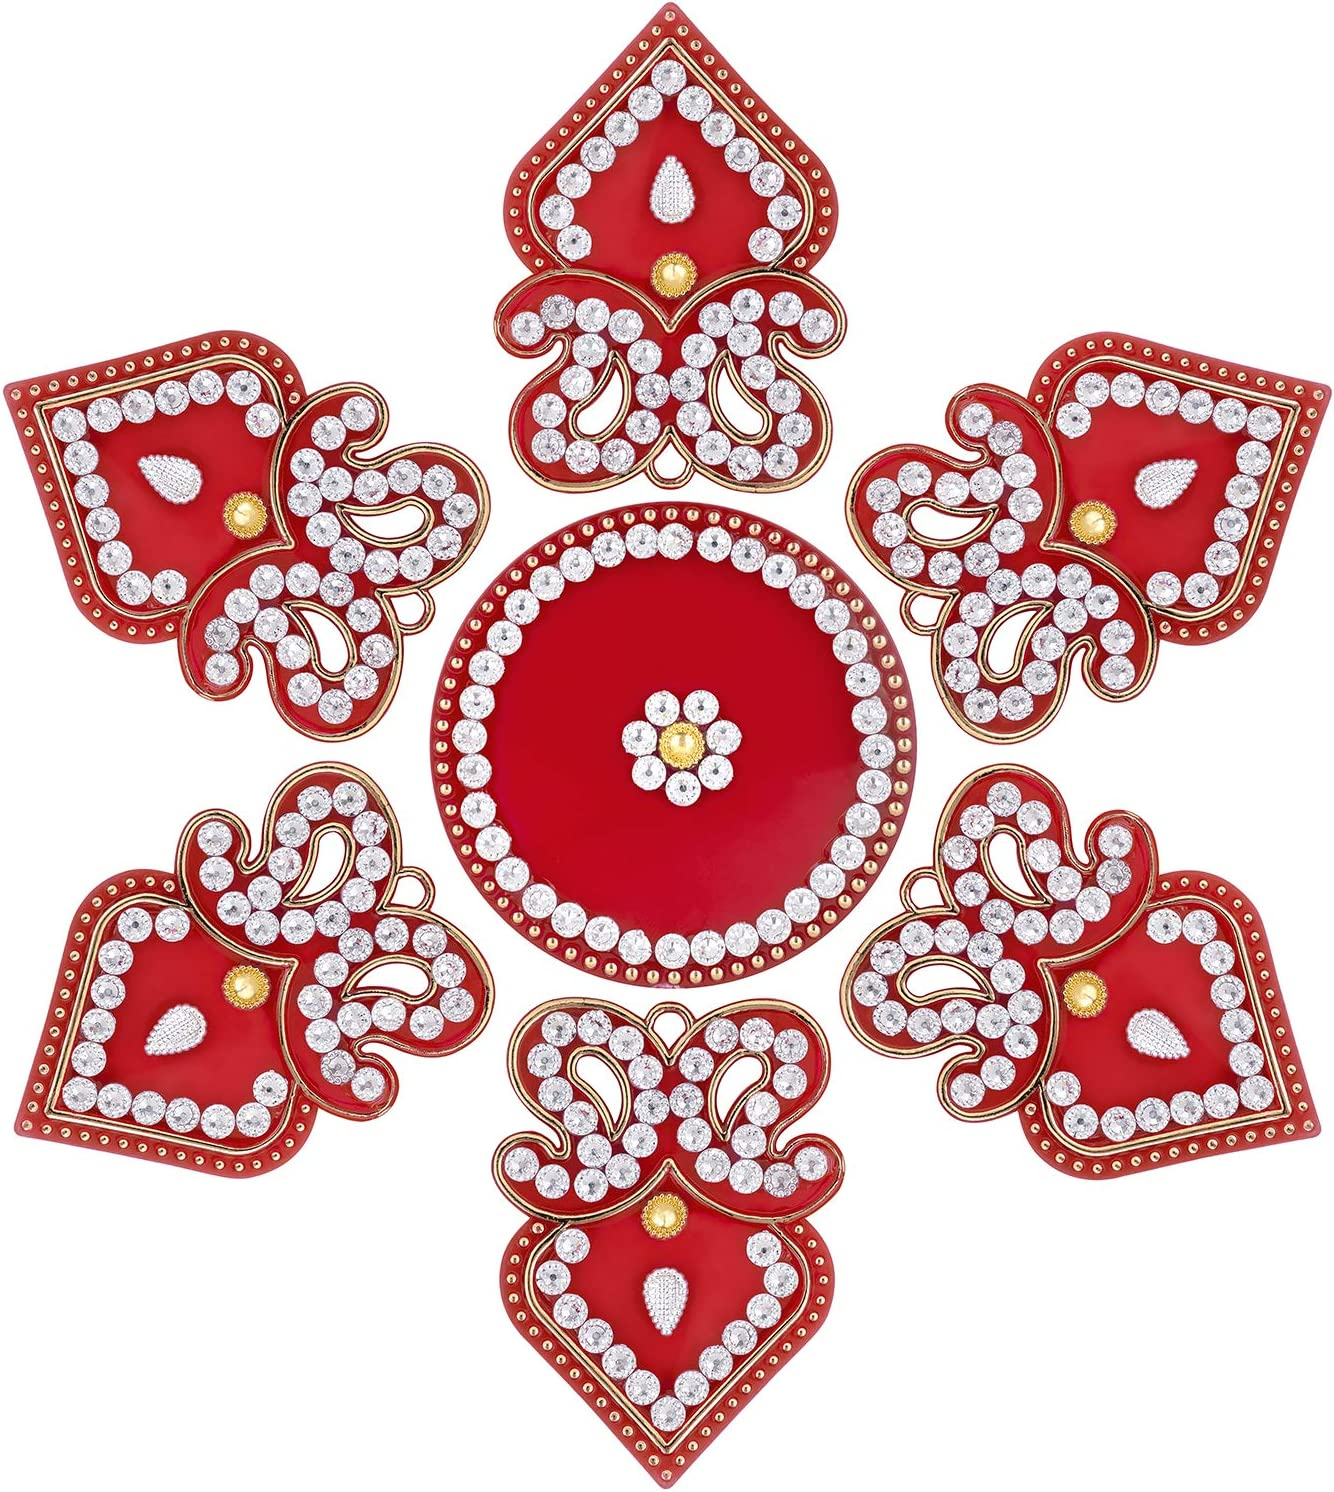 Aheli Double Paisley with Modak Acrylic Rangoli Indian Traditional Floor Decoration for Diwali Festive Seasonal Office Home Decor